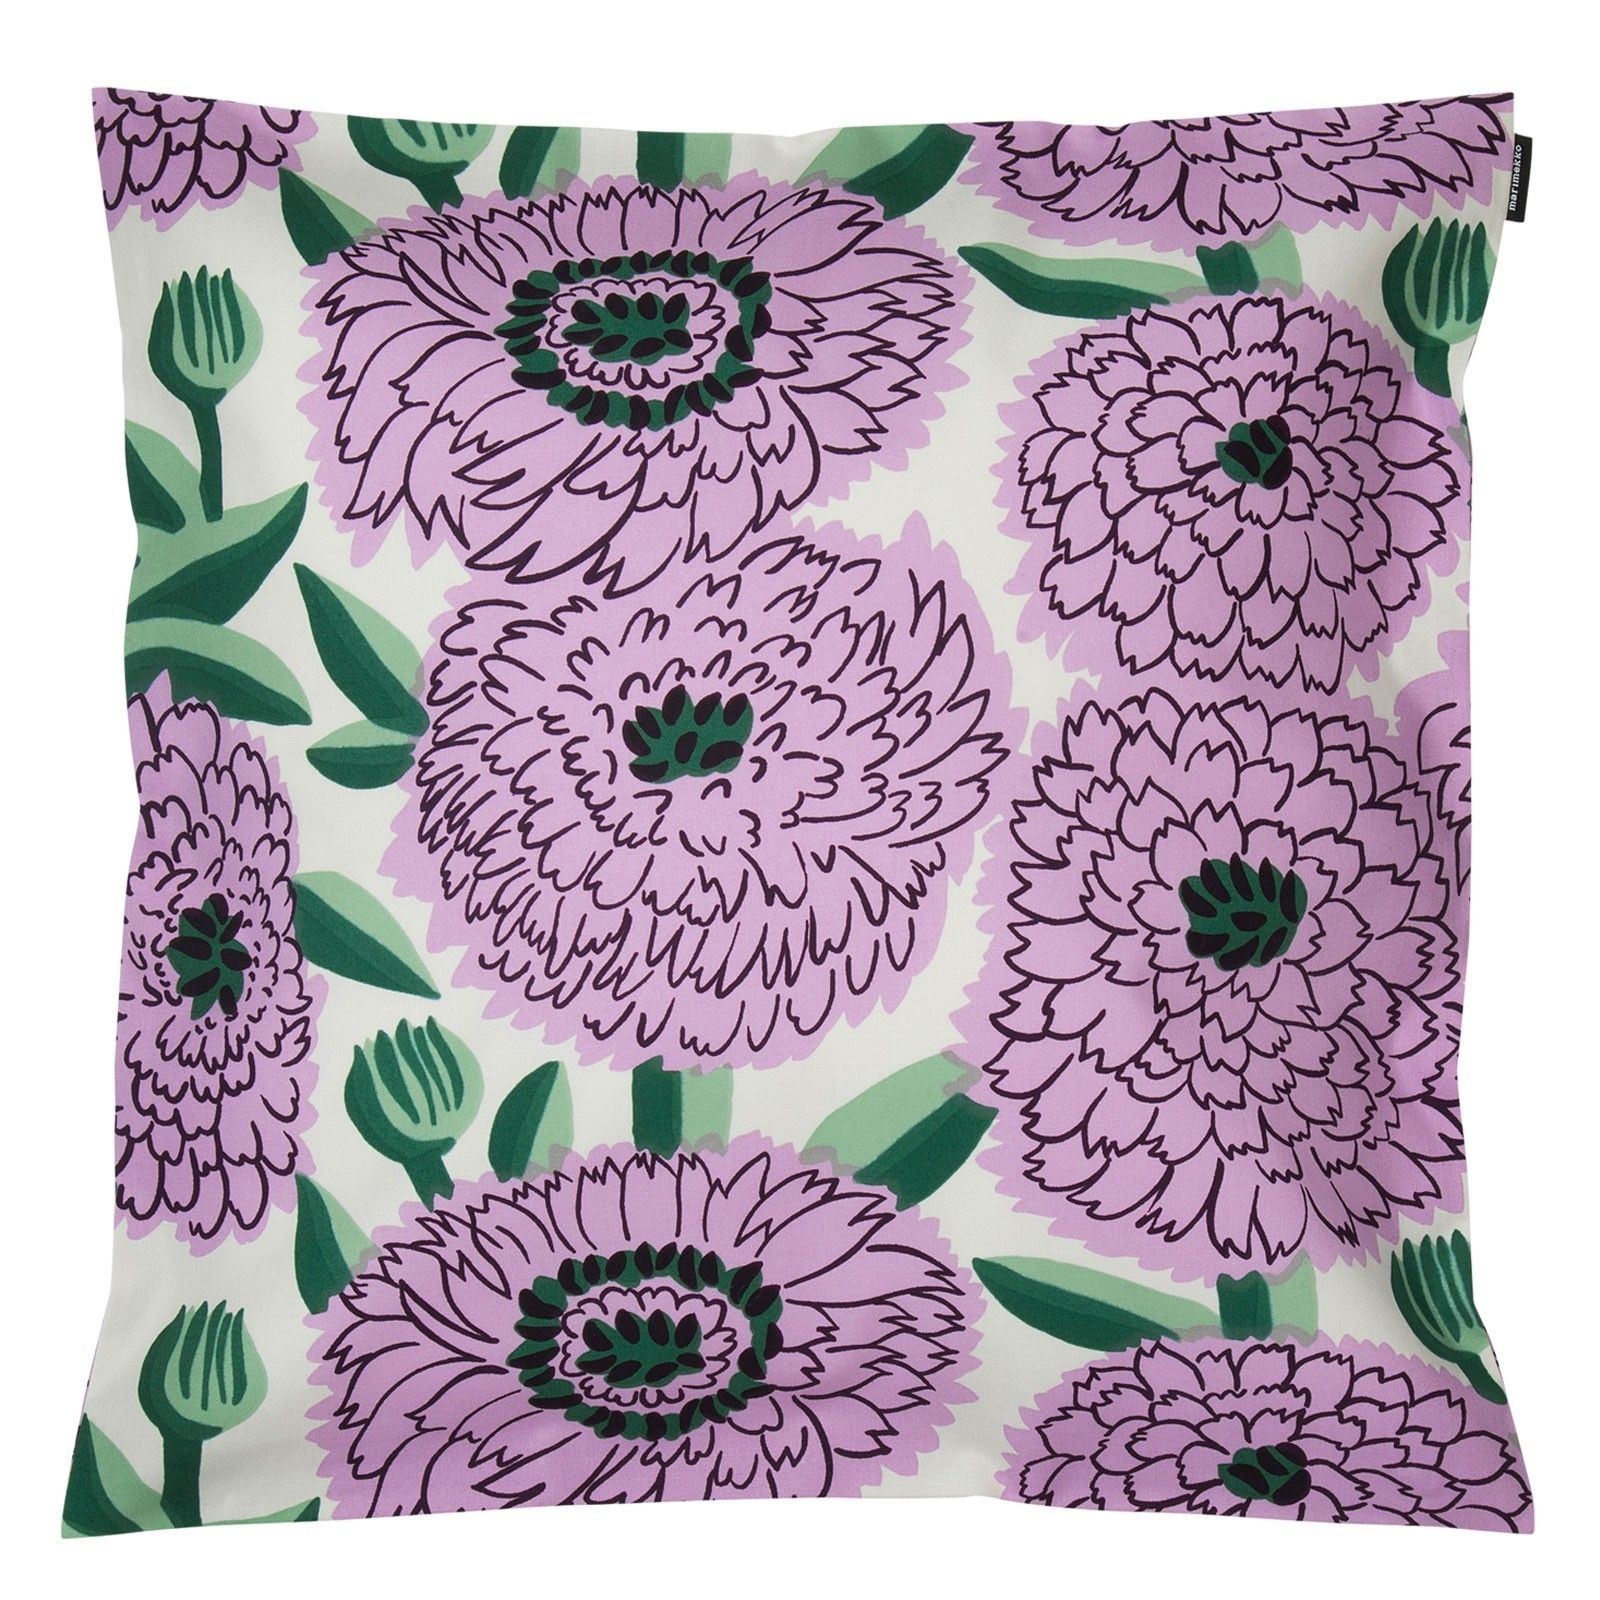 Marimekko Pieni Primavera Kissenbezug 45 X 45 Cm Violett F S 20 Cushion Cover Marimekko Cushion Covers